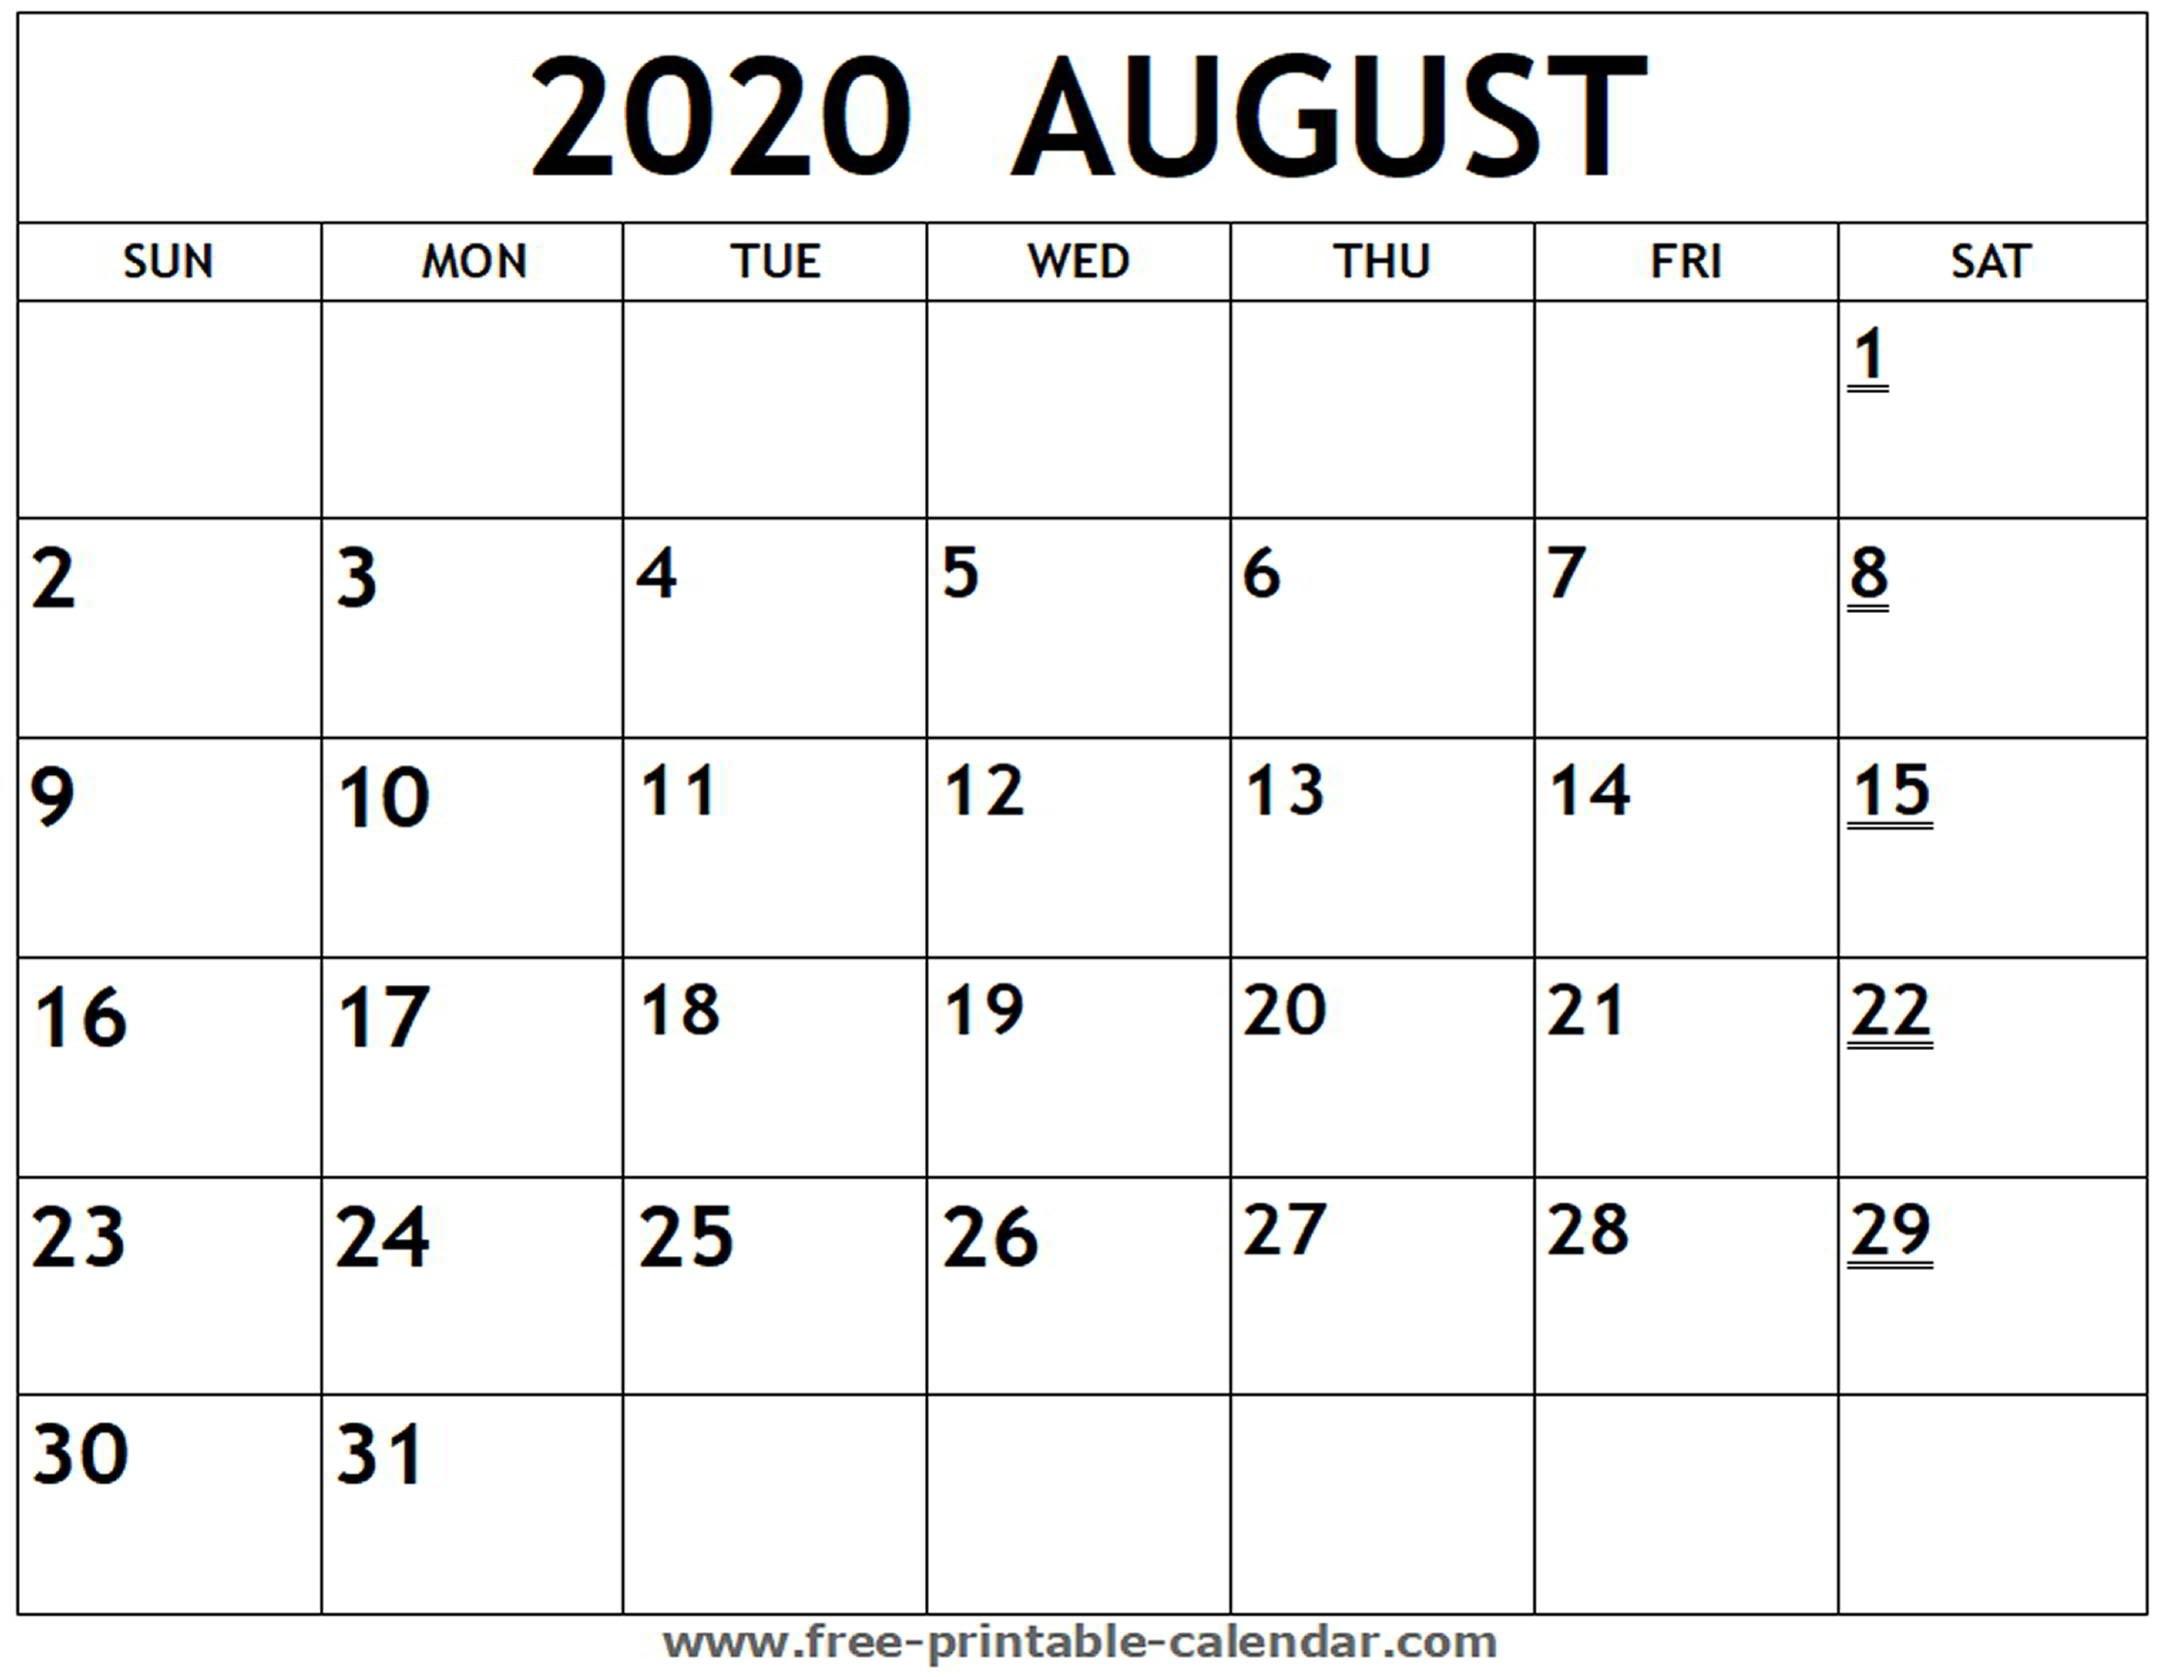 Printable 2020 August Calendar - Free-Printable-Calendar-Blank Calendar June July August 2020